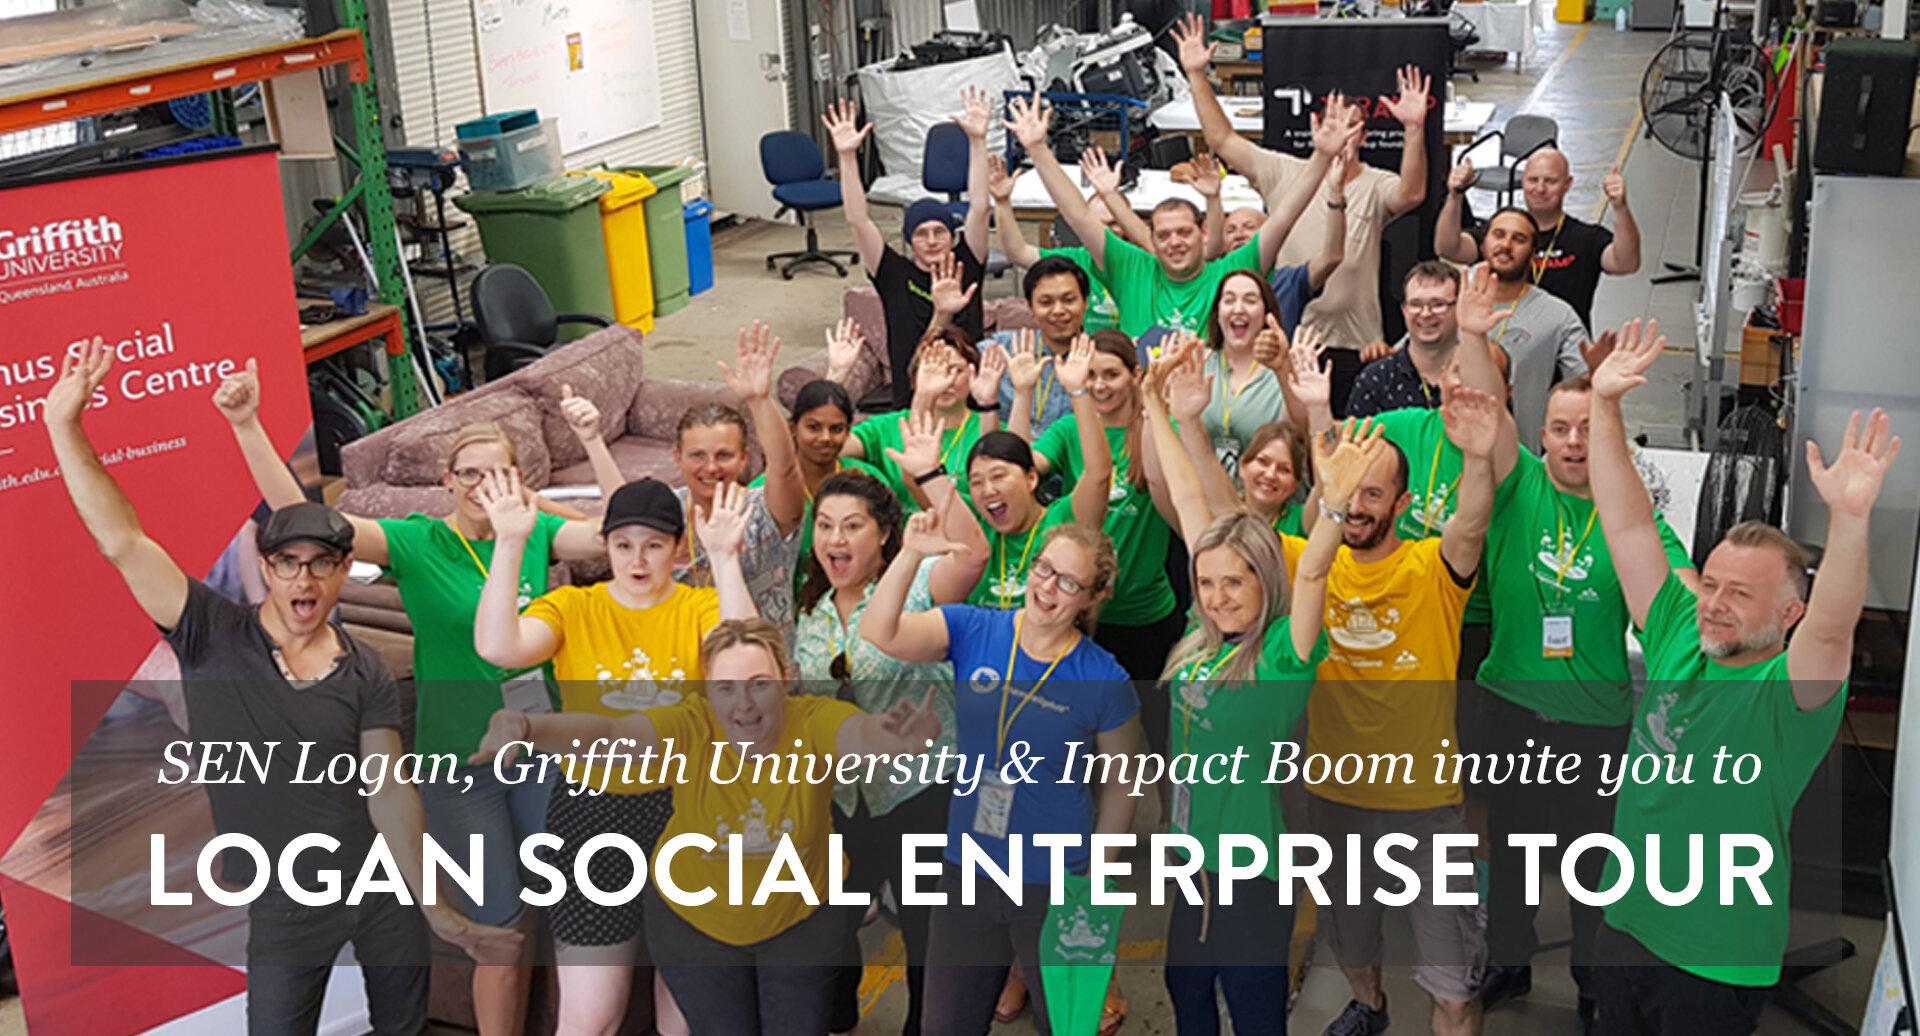 Logan-social-enterprise-tour-fb-event.jpg